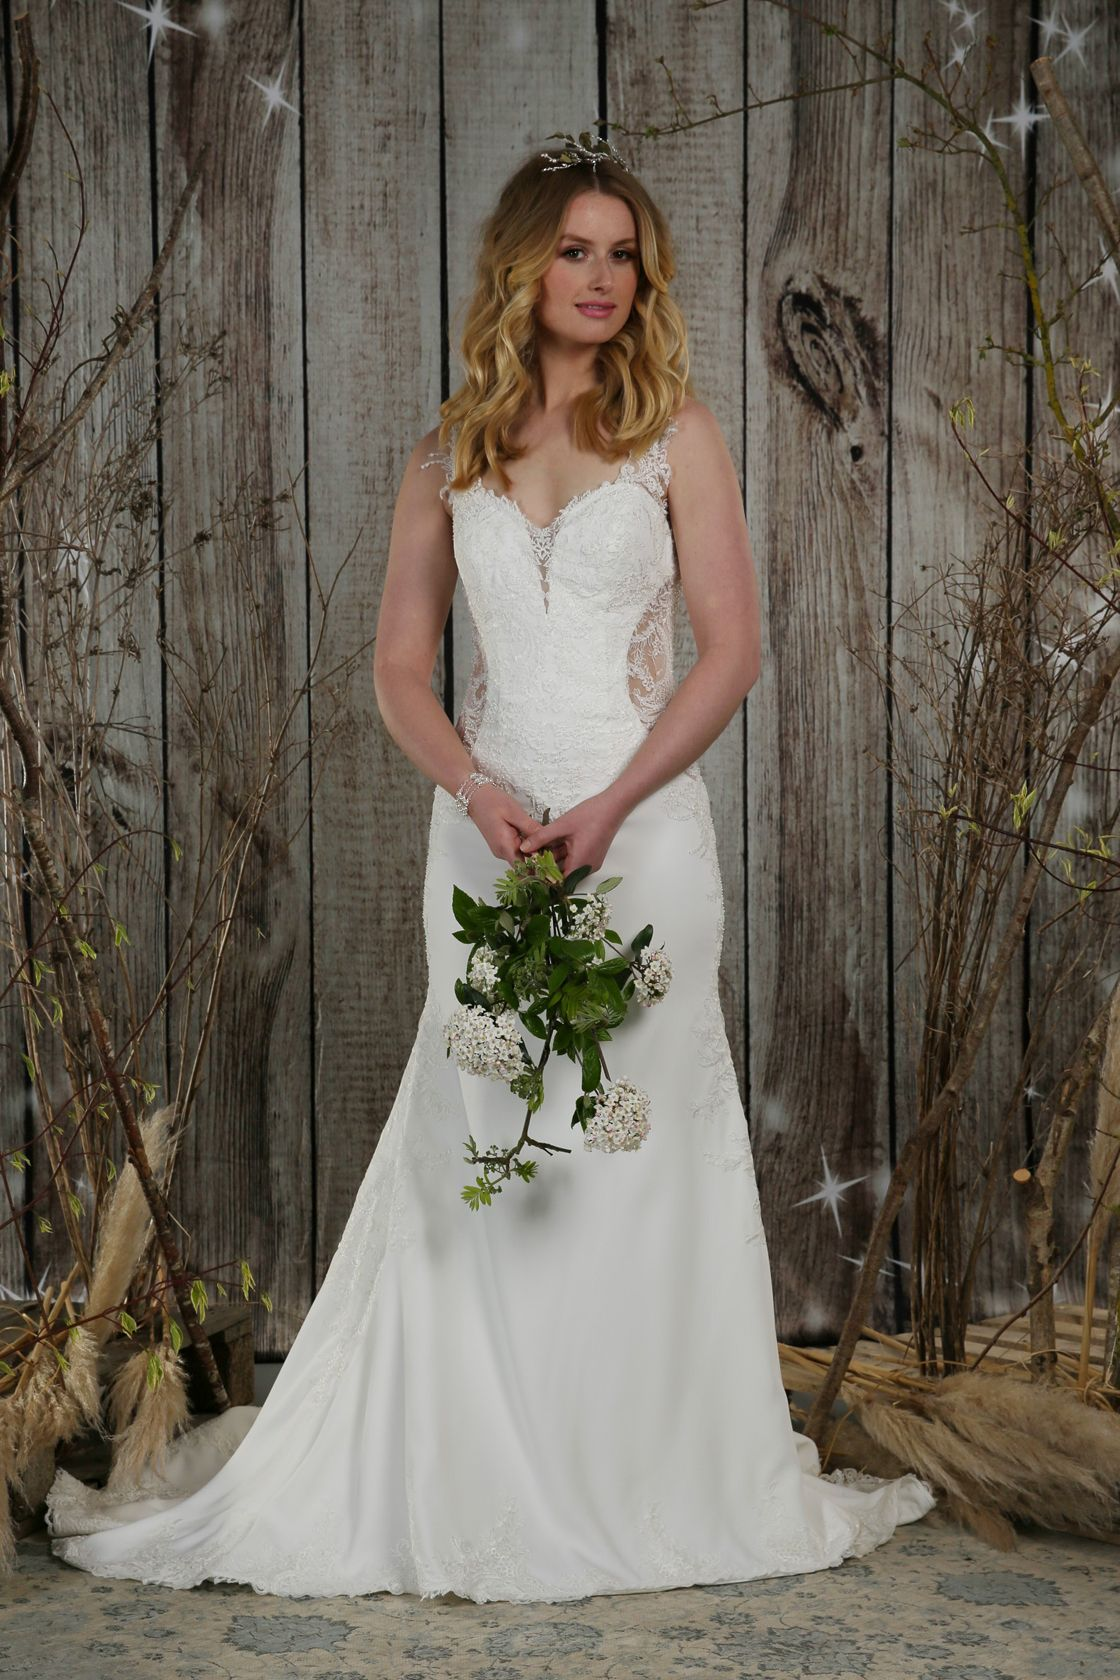 Nicole RDB1176 Richard Designs Bridal Collection Bridal